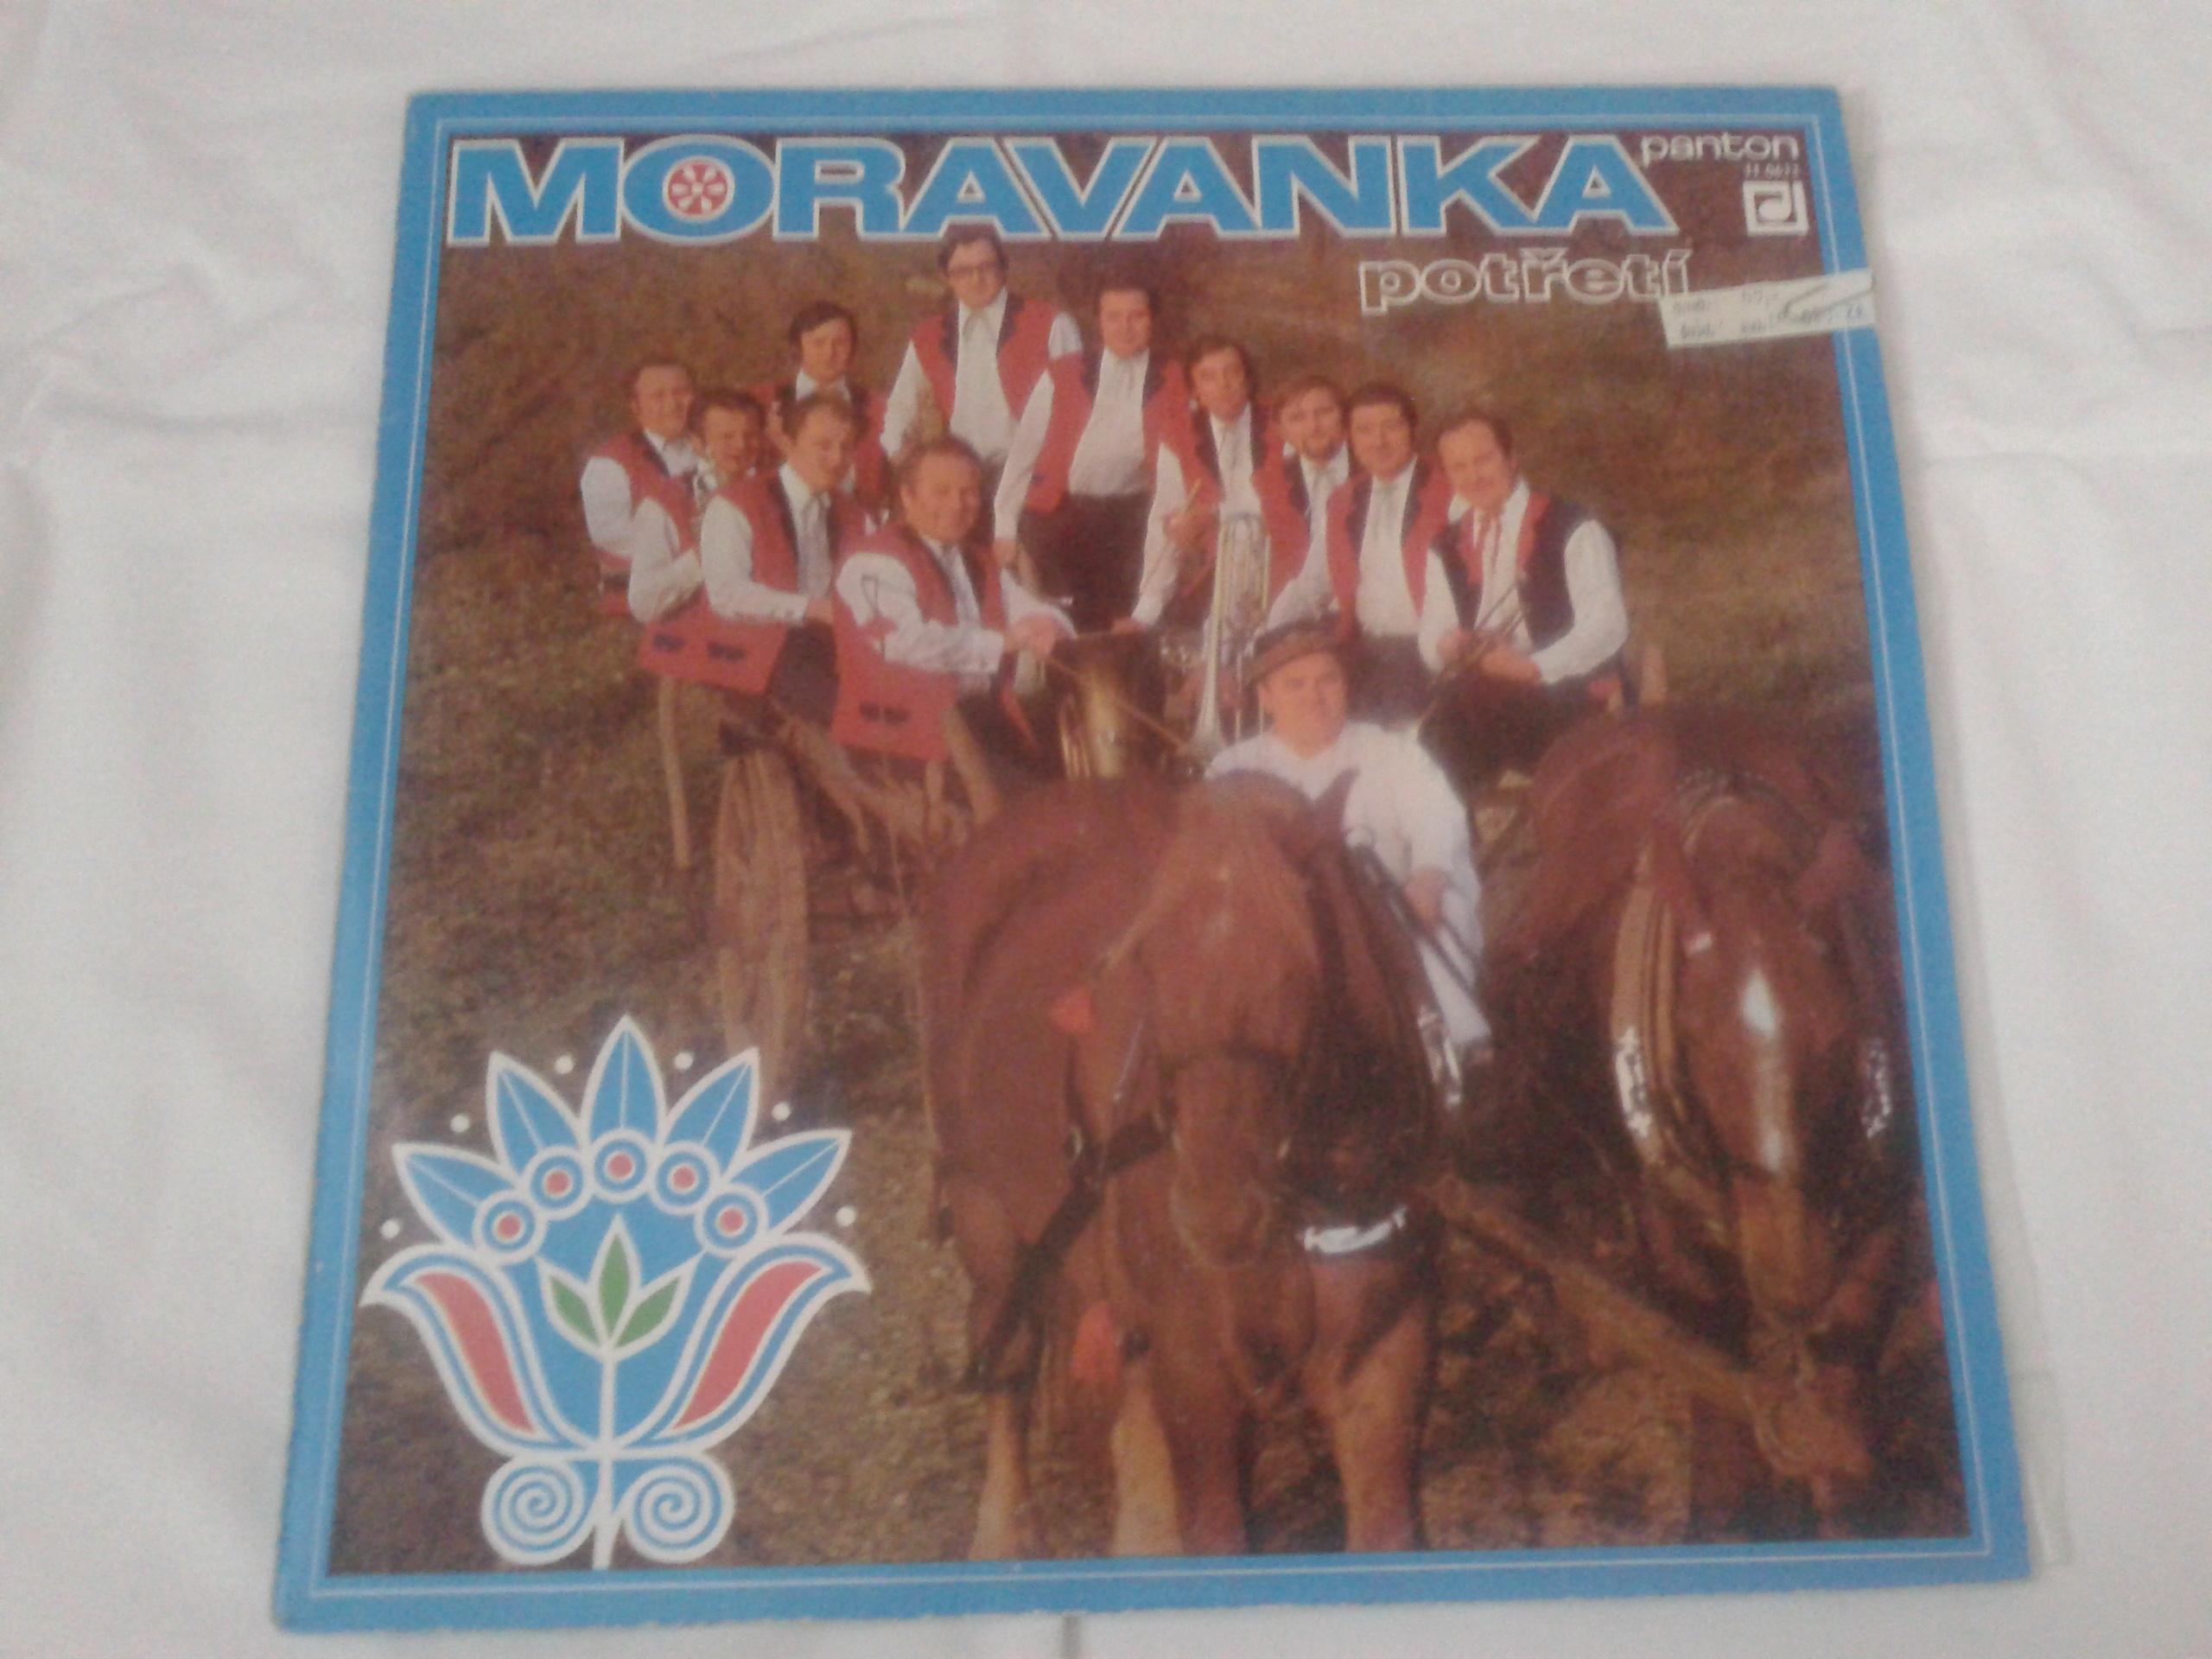 Moravanka potřetí - Moravanka (gramodeska)